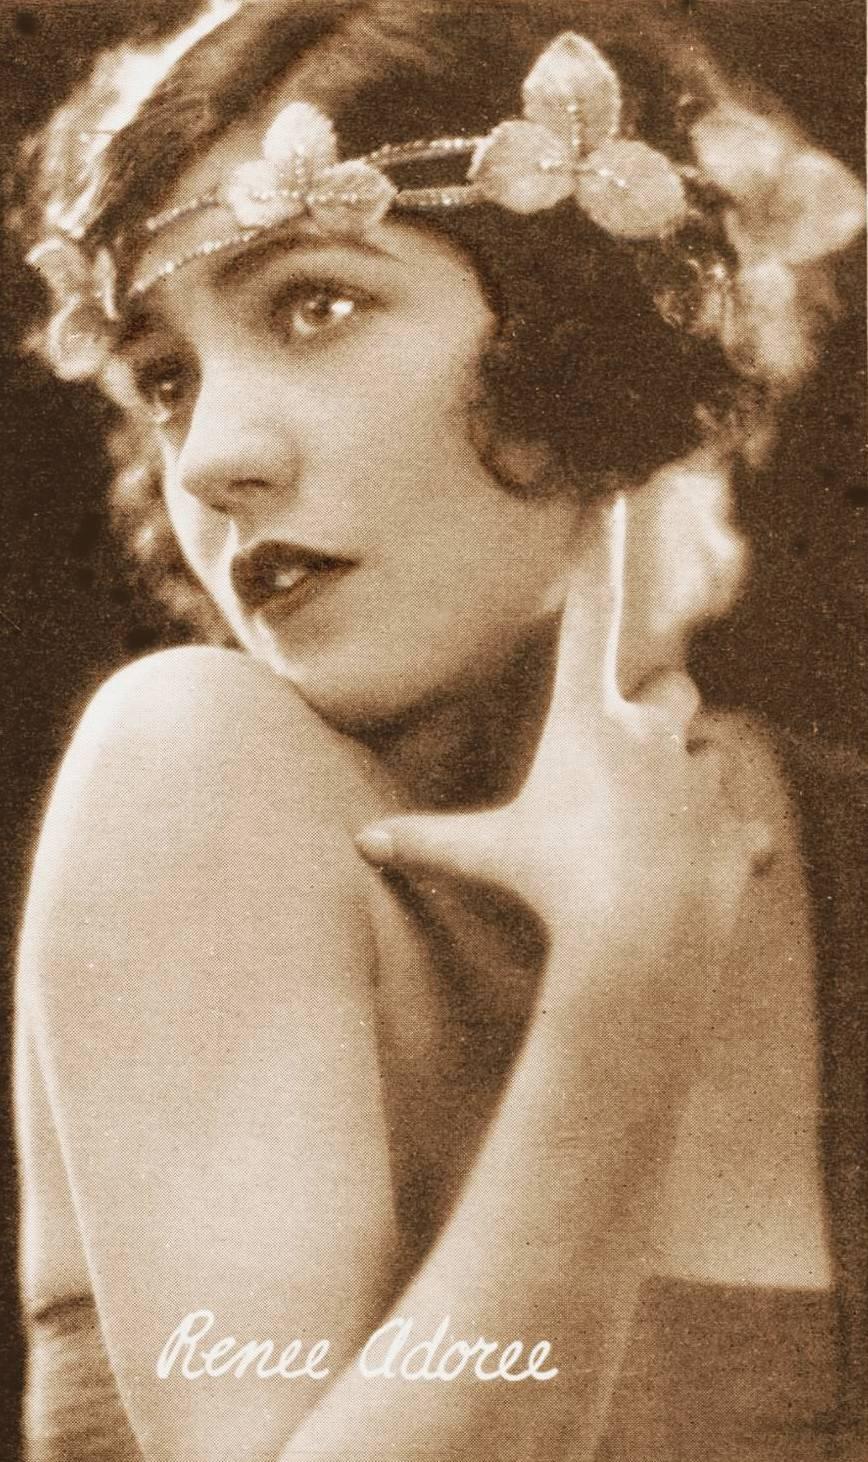 1920  Renee Adoree.jpg